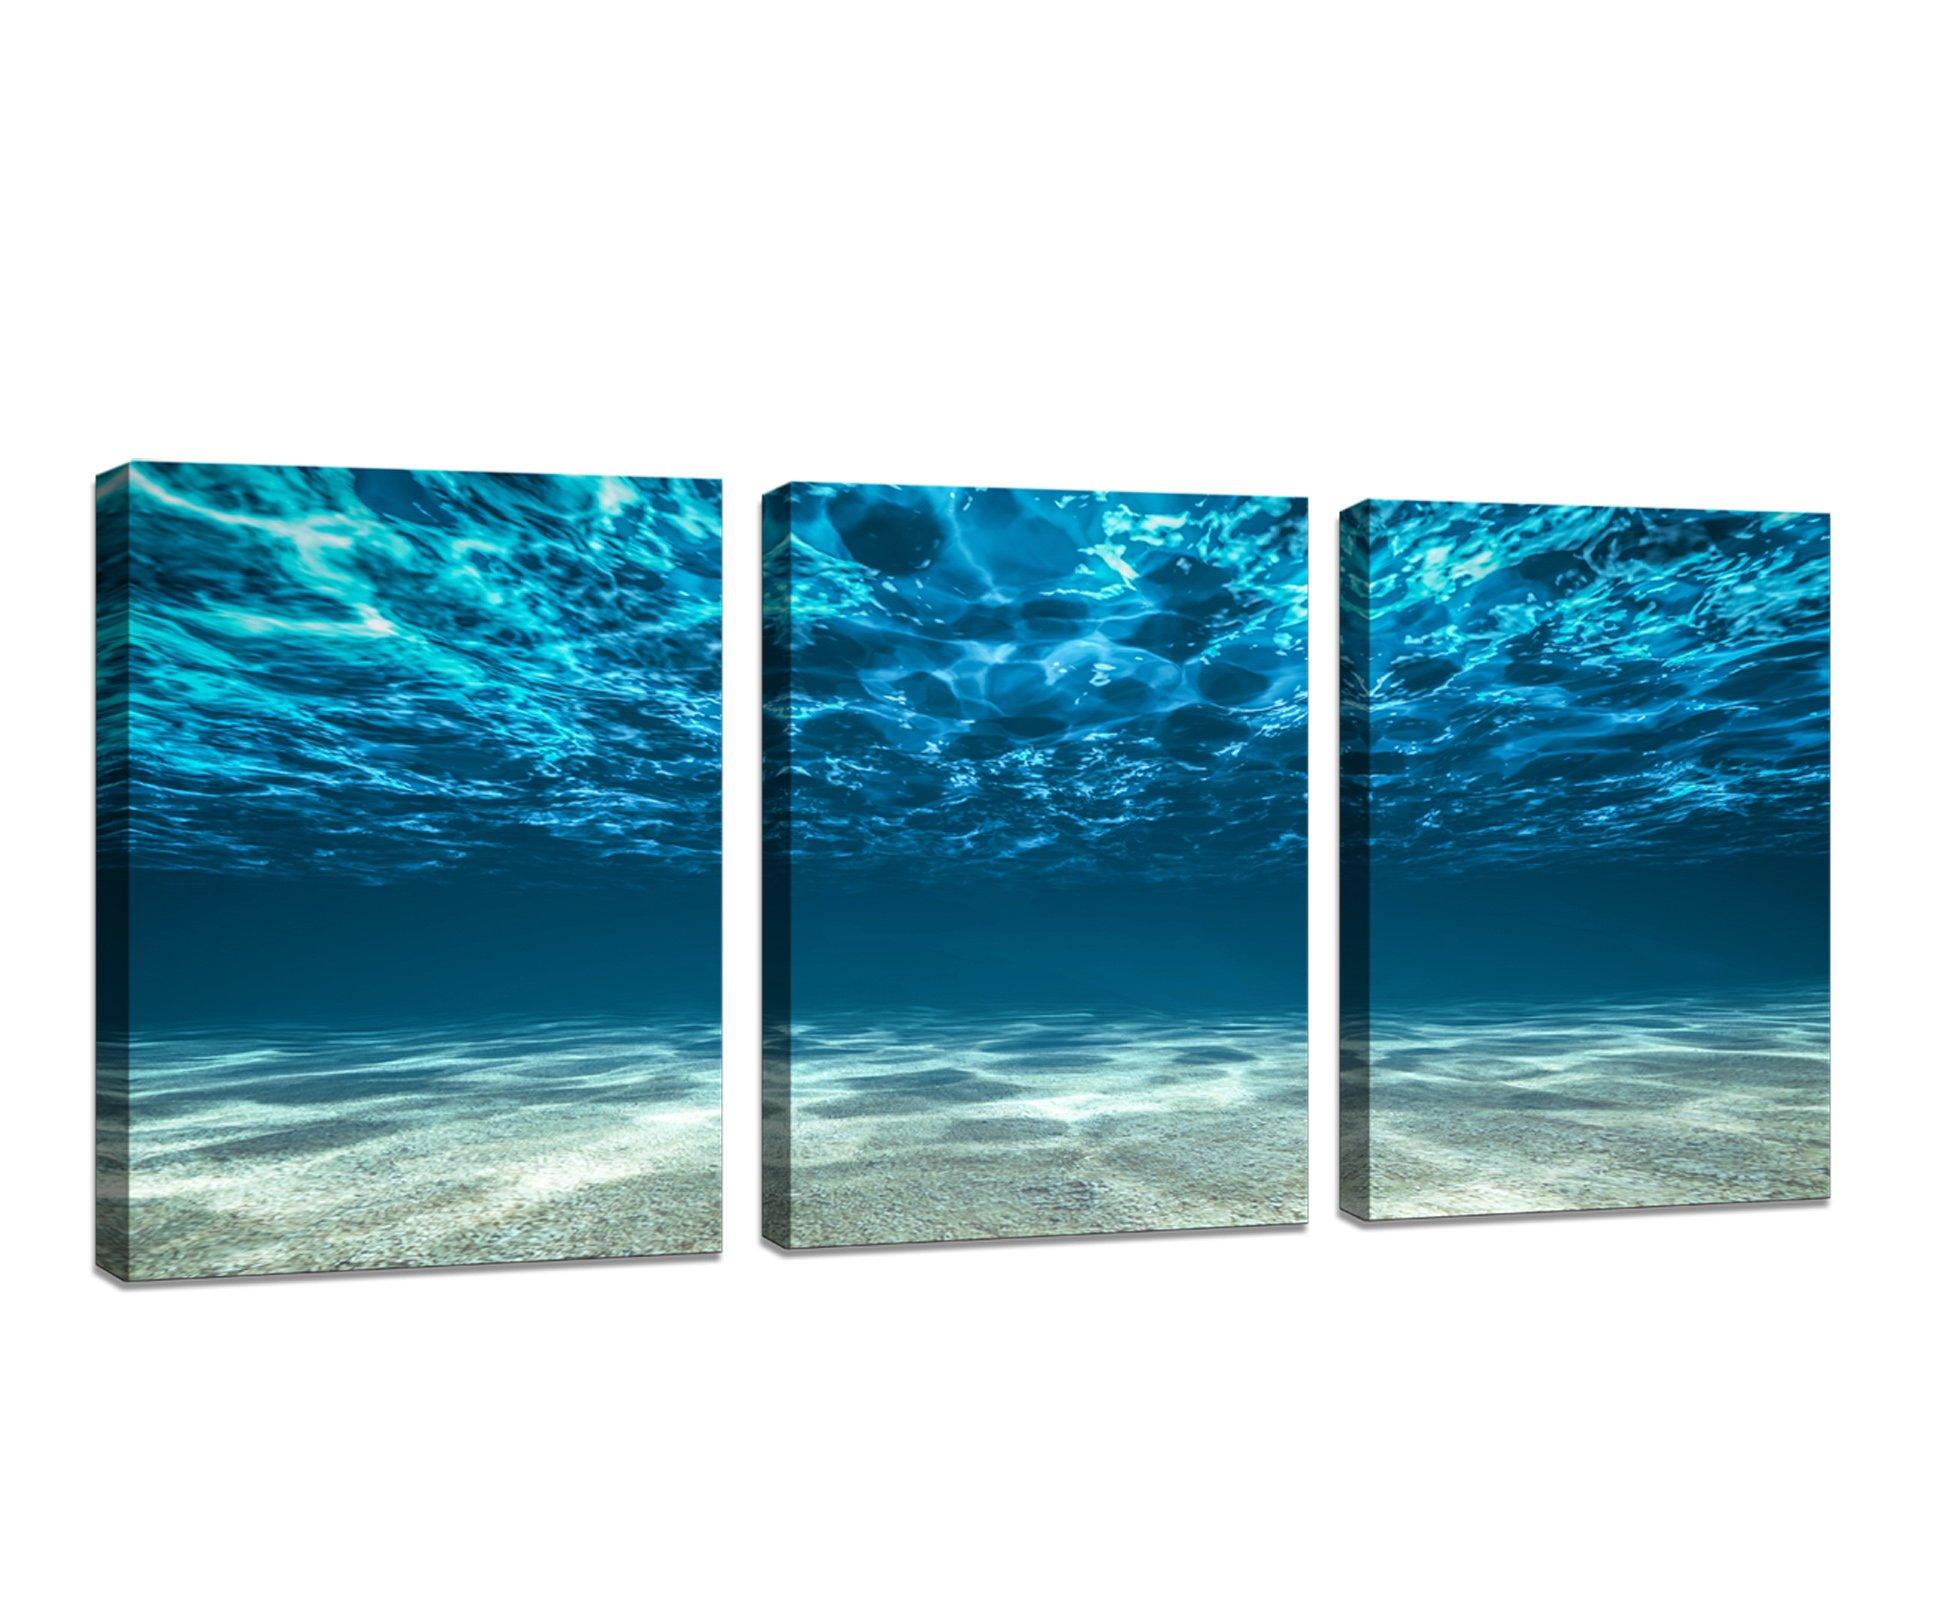 Baisuart Wall Art 3 Panels Print Artwork Blue Ocean Sea...